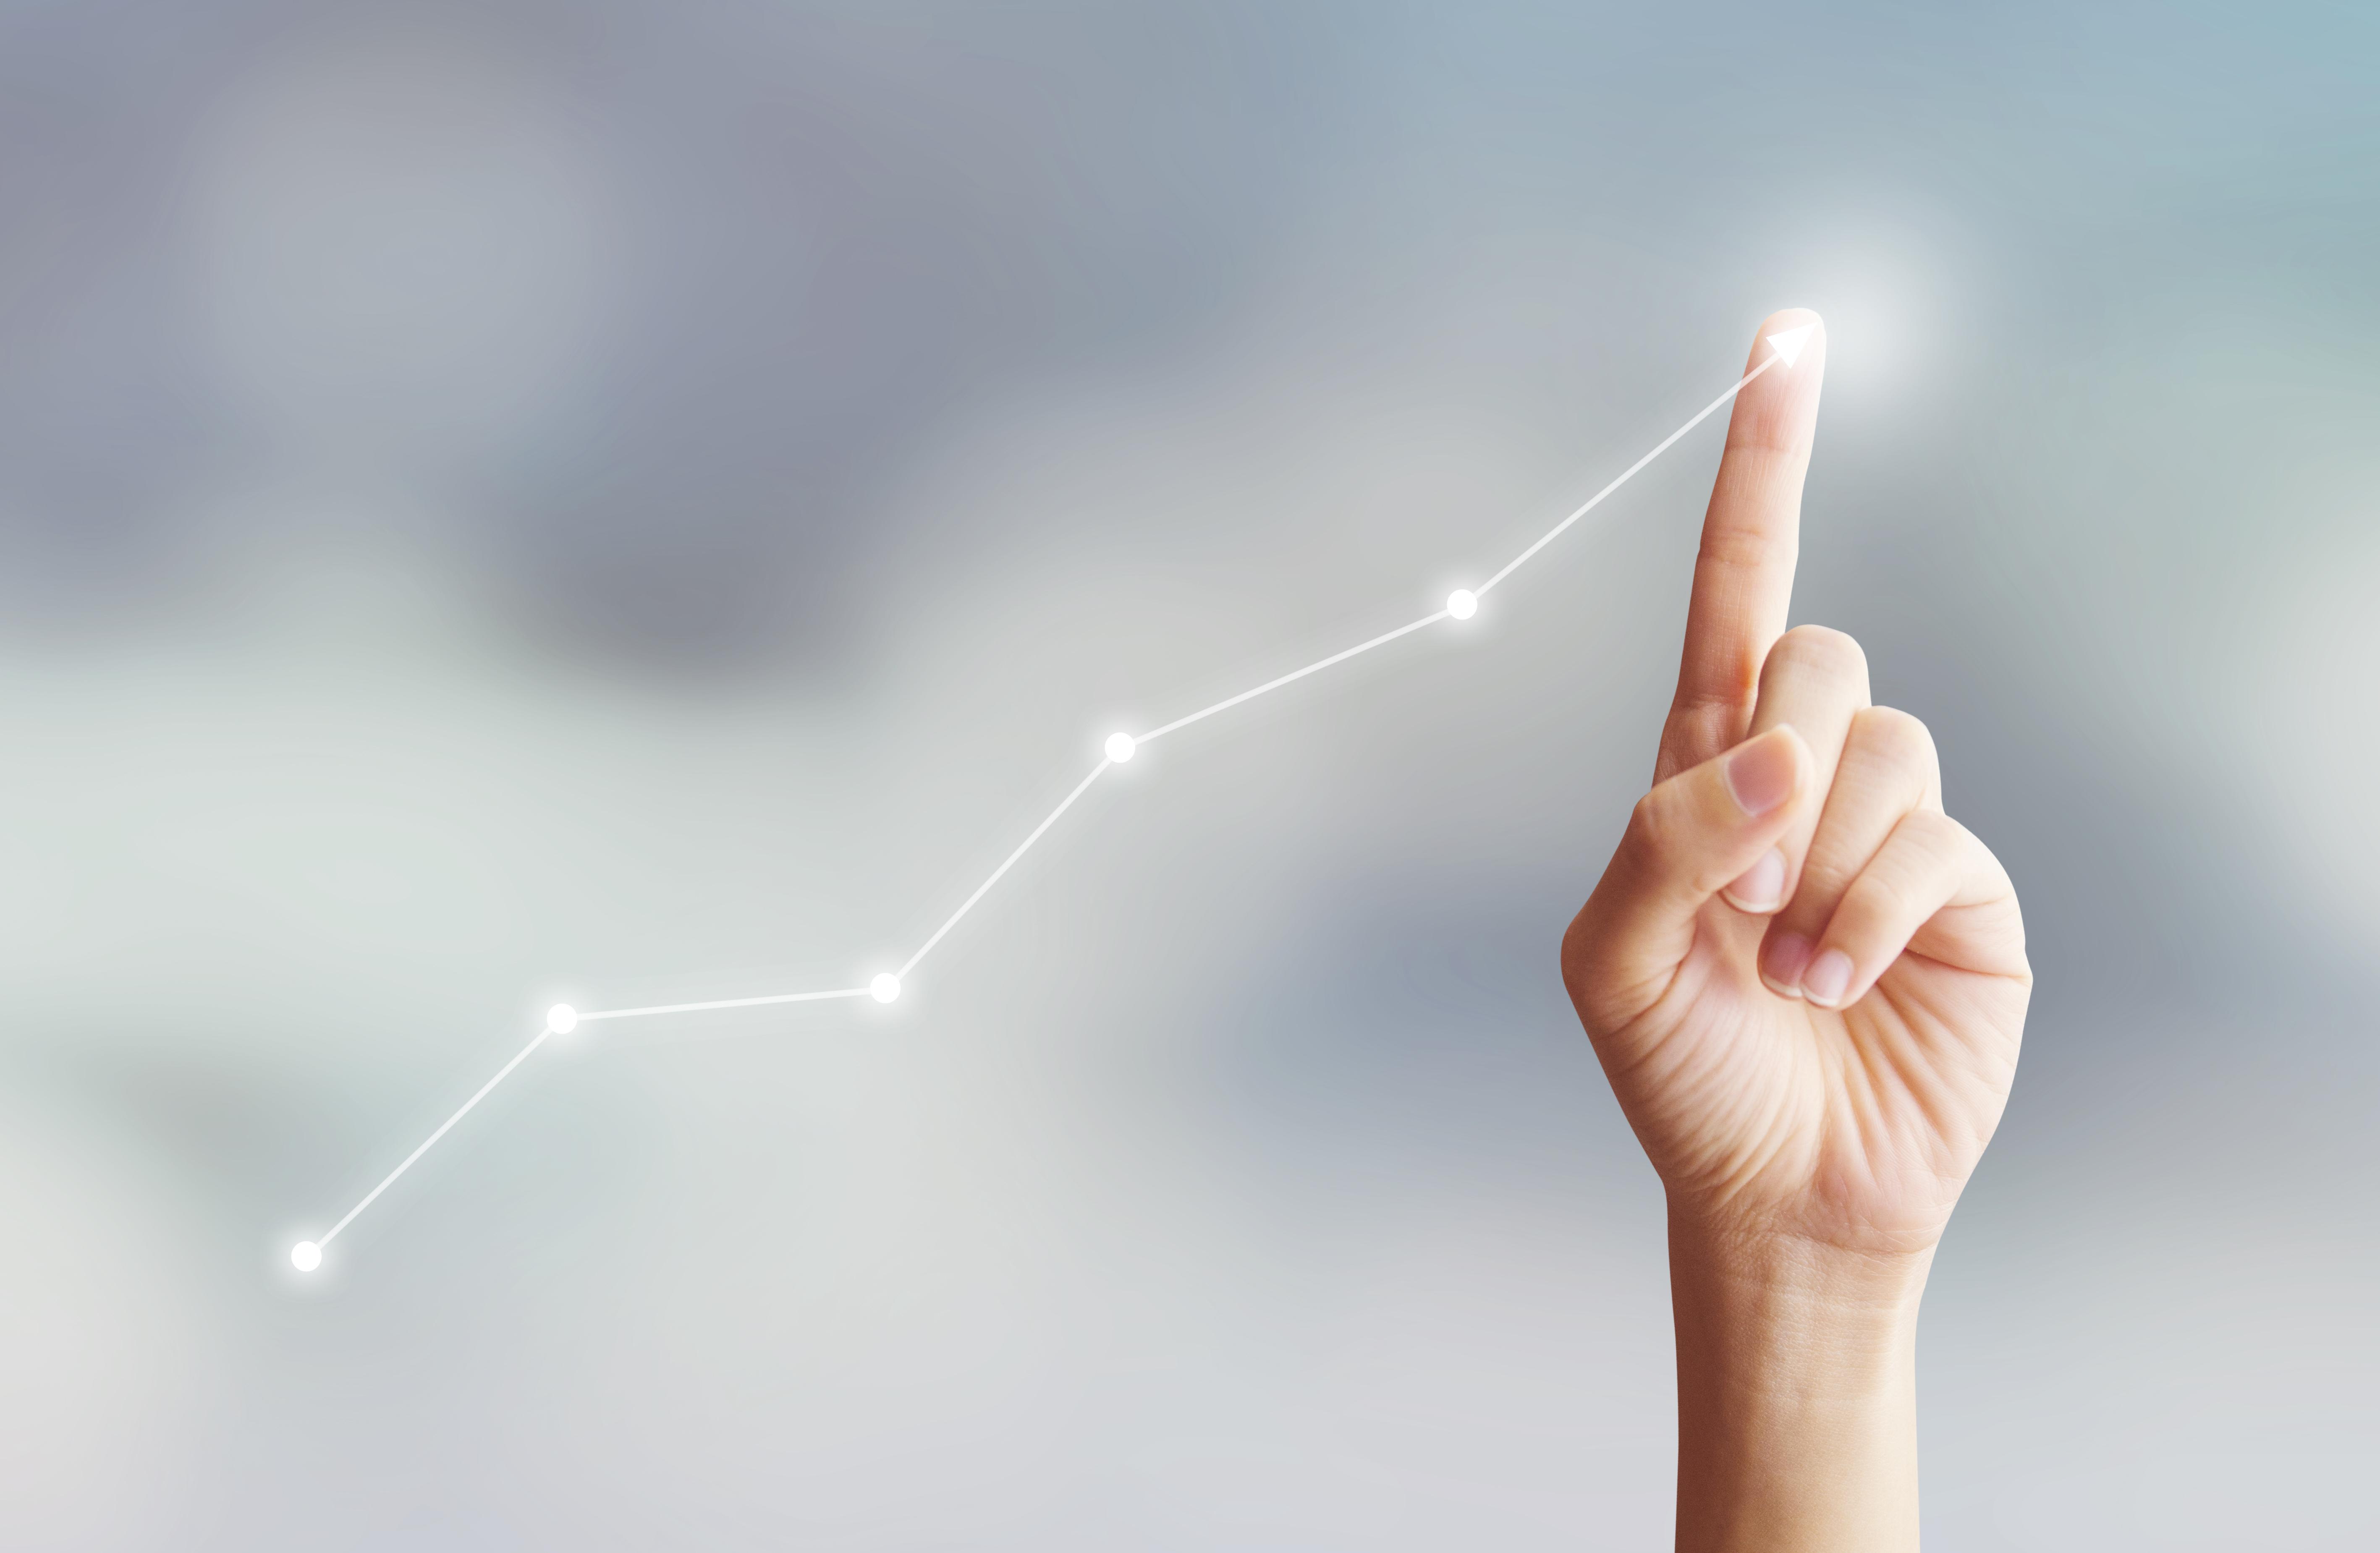 5 Ways CORTEXImproves the Utilization Review Process